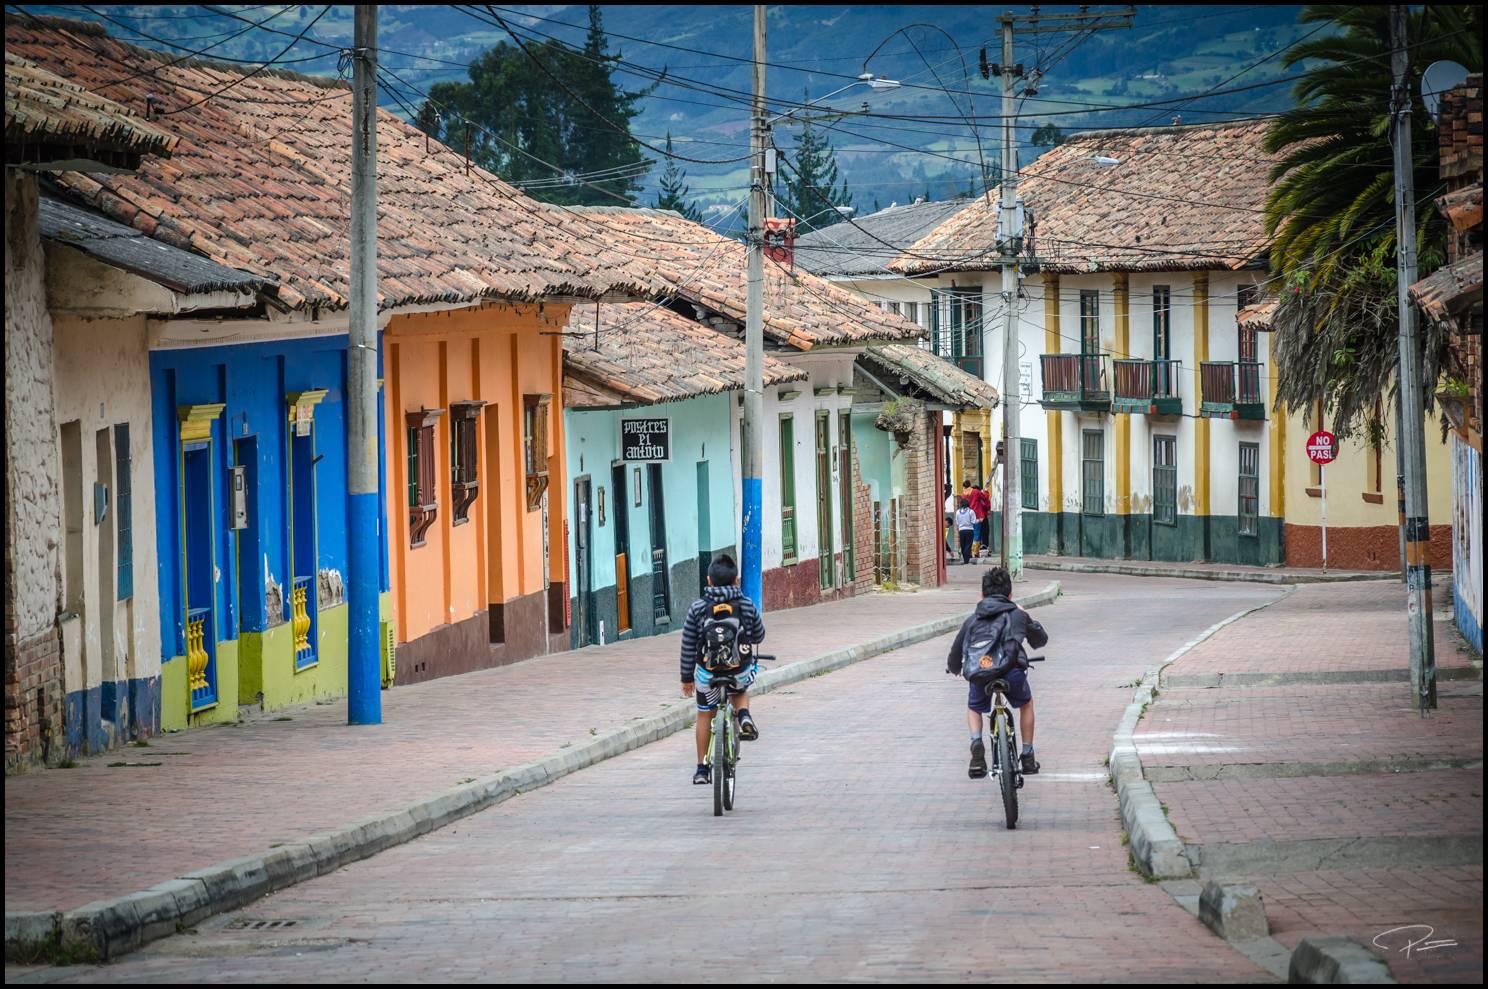 Bogota Nemocon 26Sept2013 PG 026